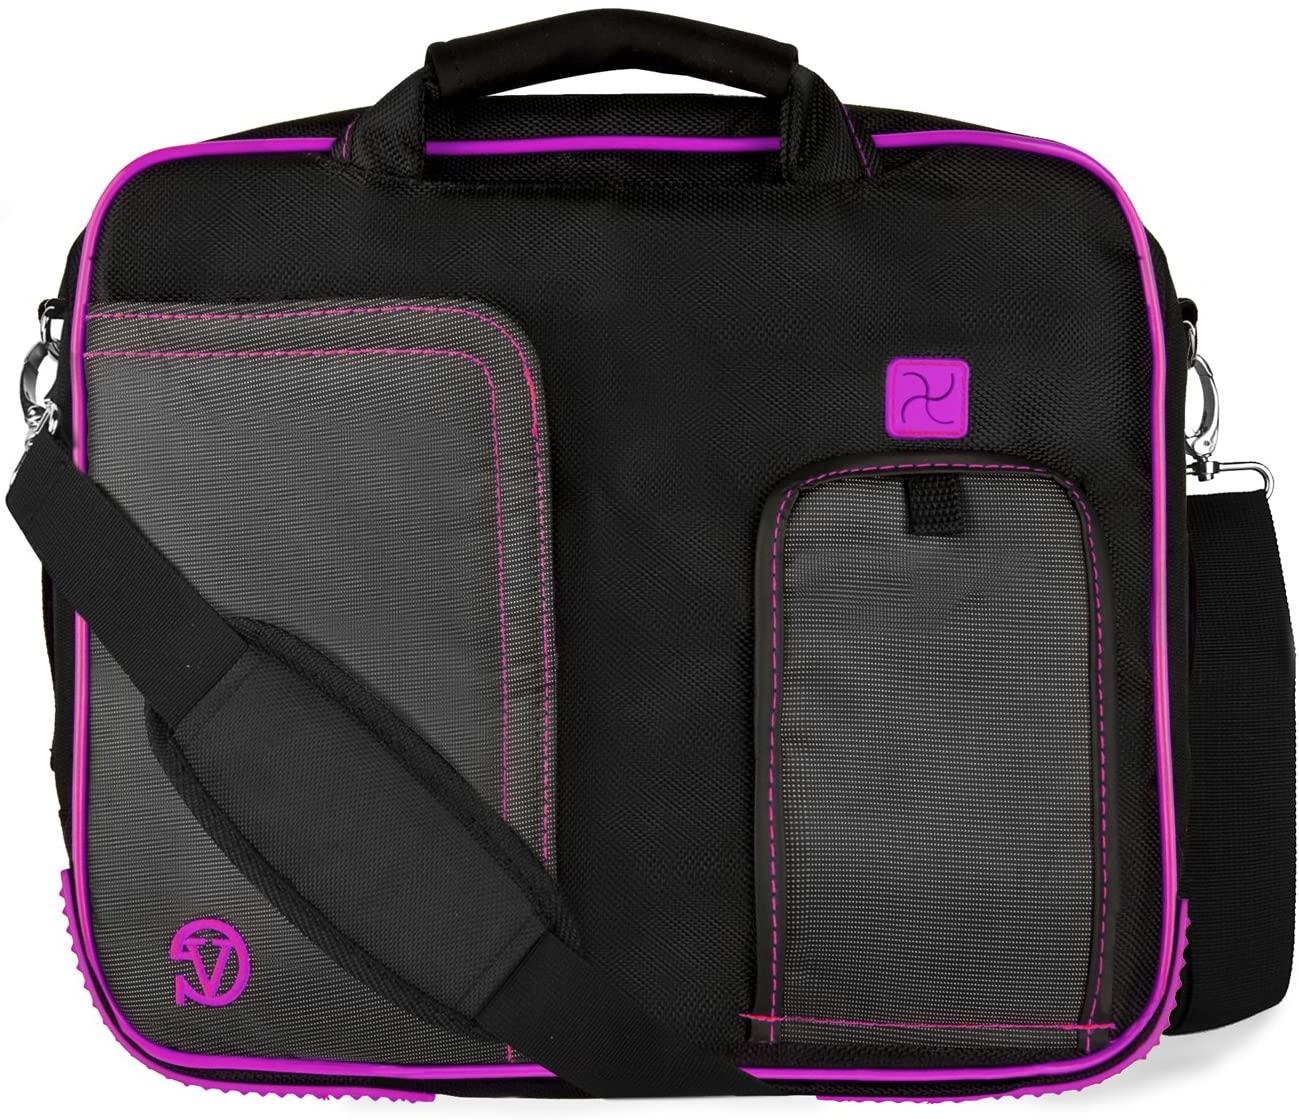 Pindar Messenger Bag for 11 to 13.3 inch Asus Vivo, ChromeBook, Transformer, Zen, U Series (Plum)